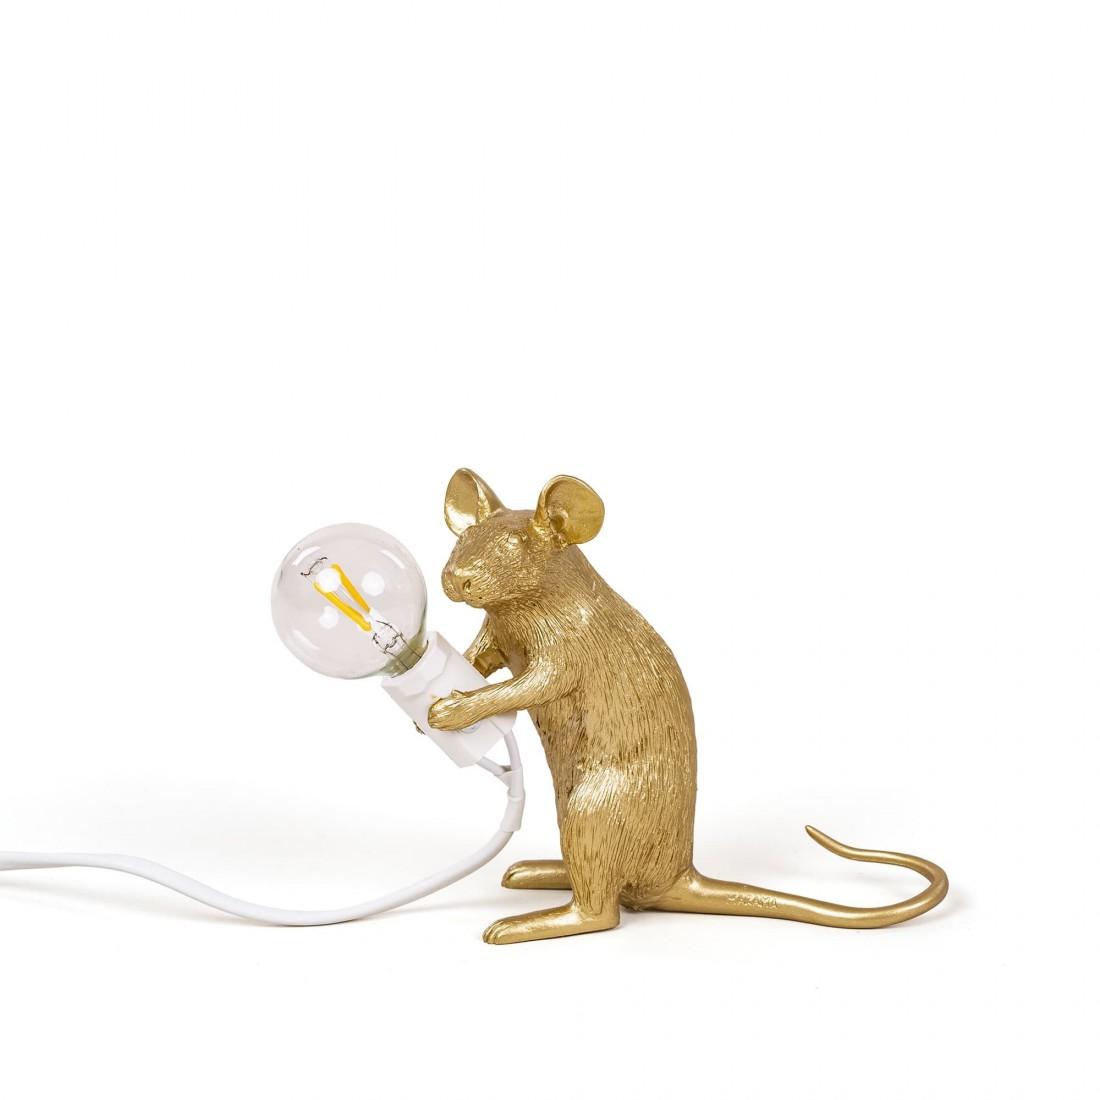 Lampe à poser Mouse Souris Gold Sitting Seletti